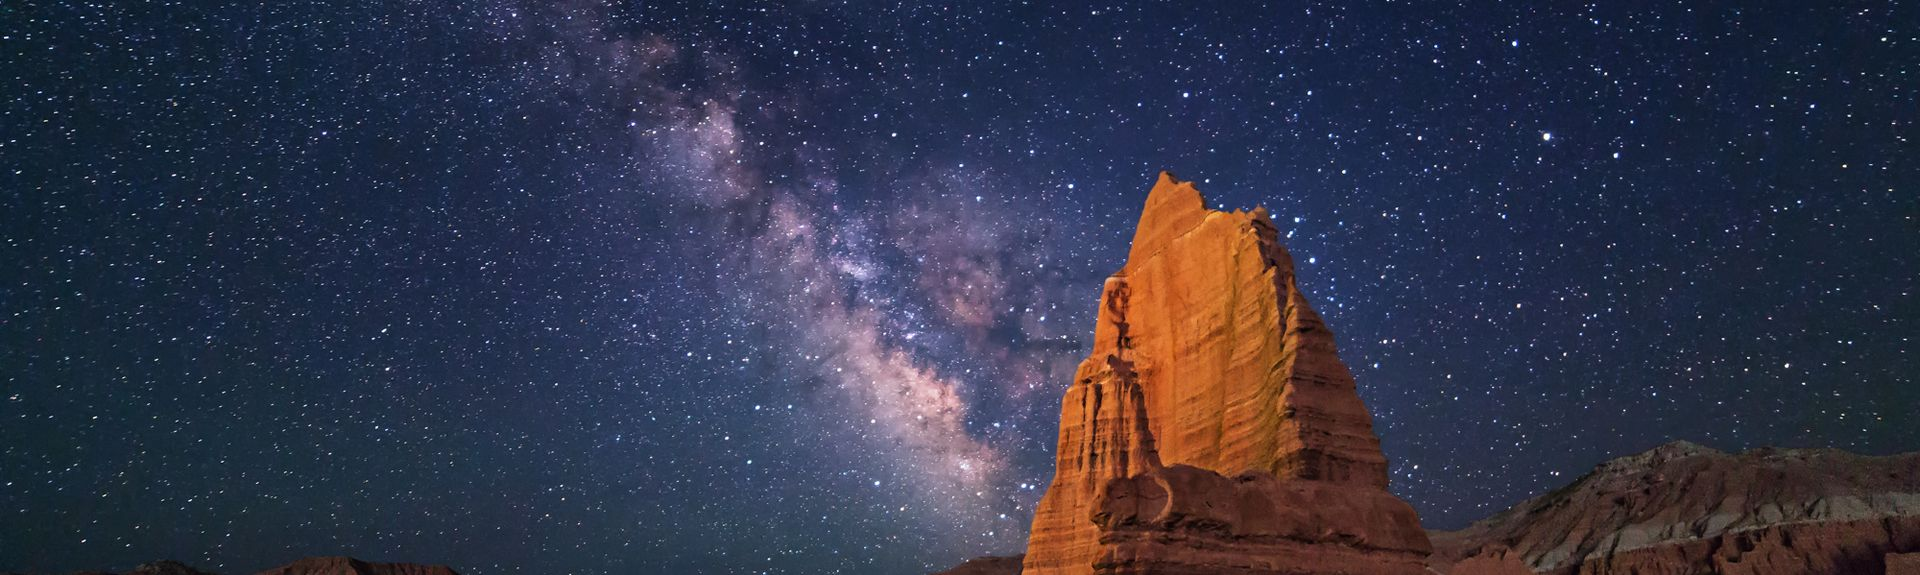 Lyman, Utah, United States of America